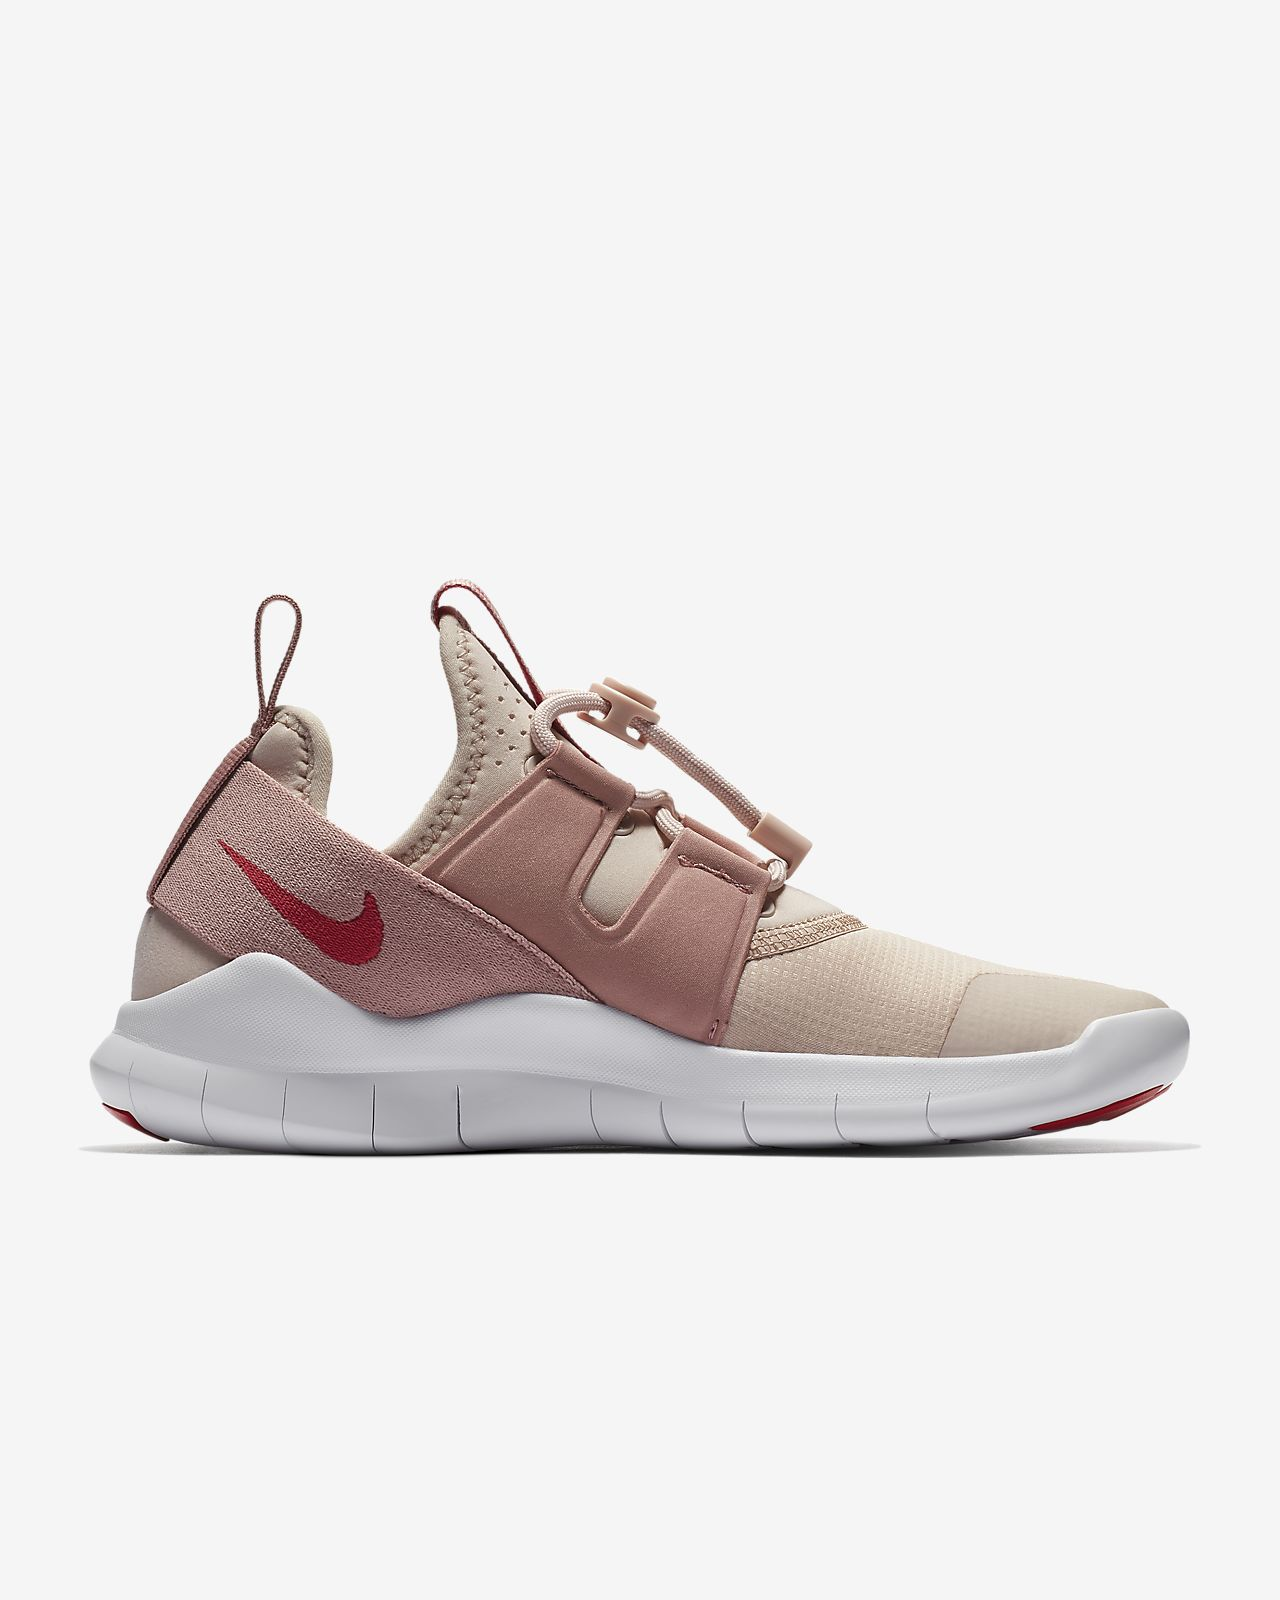 f21f8b3fdd00 Nike Free RN Commuter 2018 Women s Running Shoe. Nike.com SG